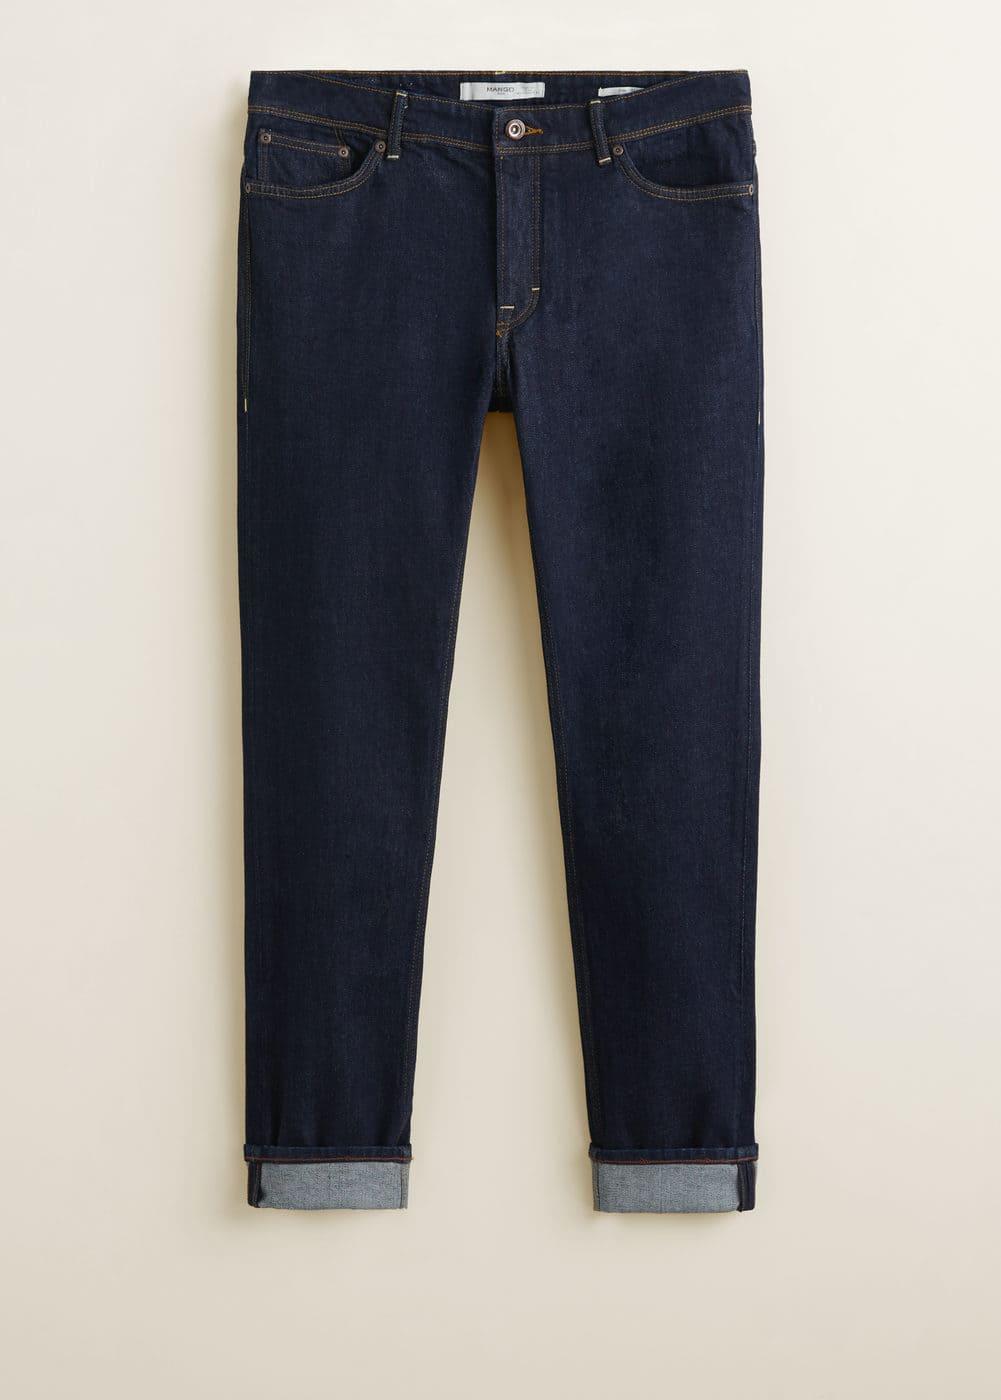 Mango - Jeans Tim slim-fit lavado oscuro - 7